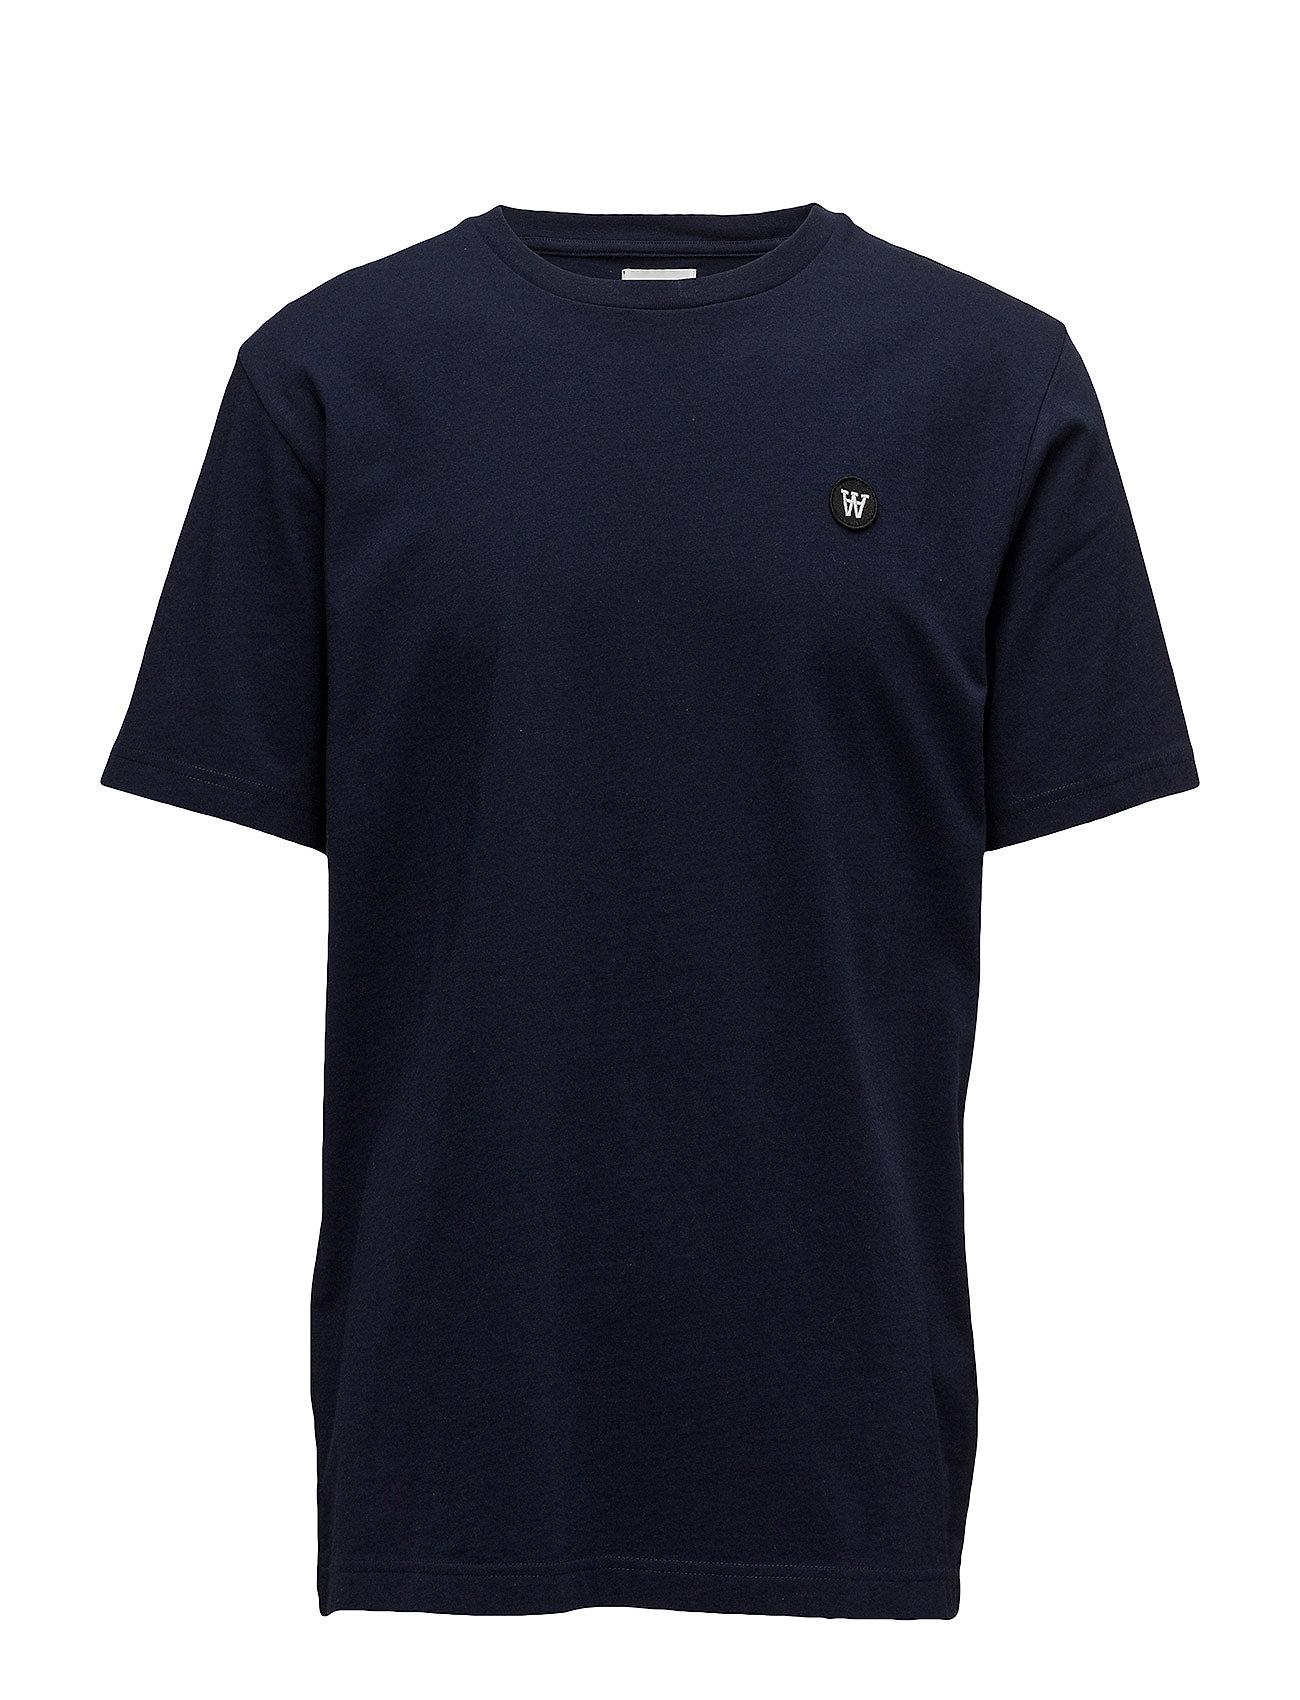 Wood Wood Ace T-shirt - NAVY